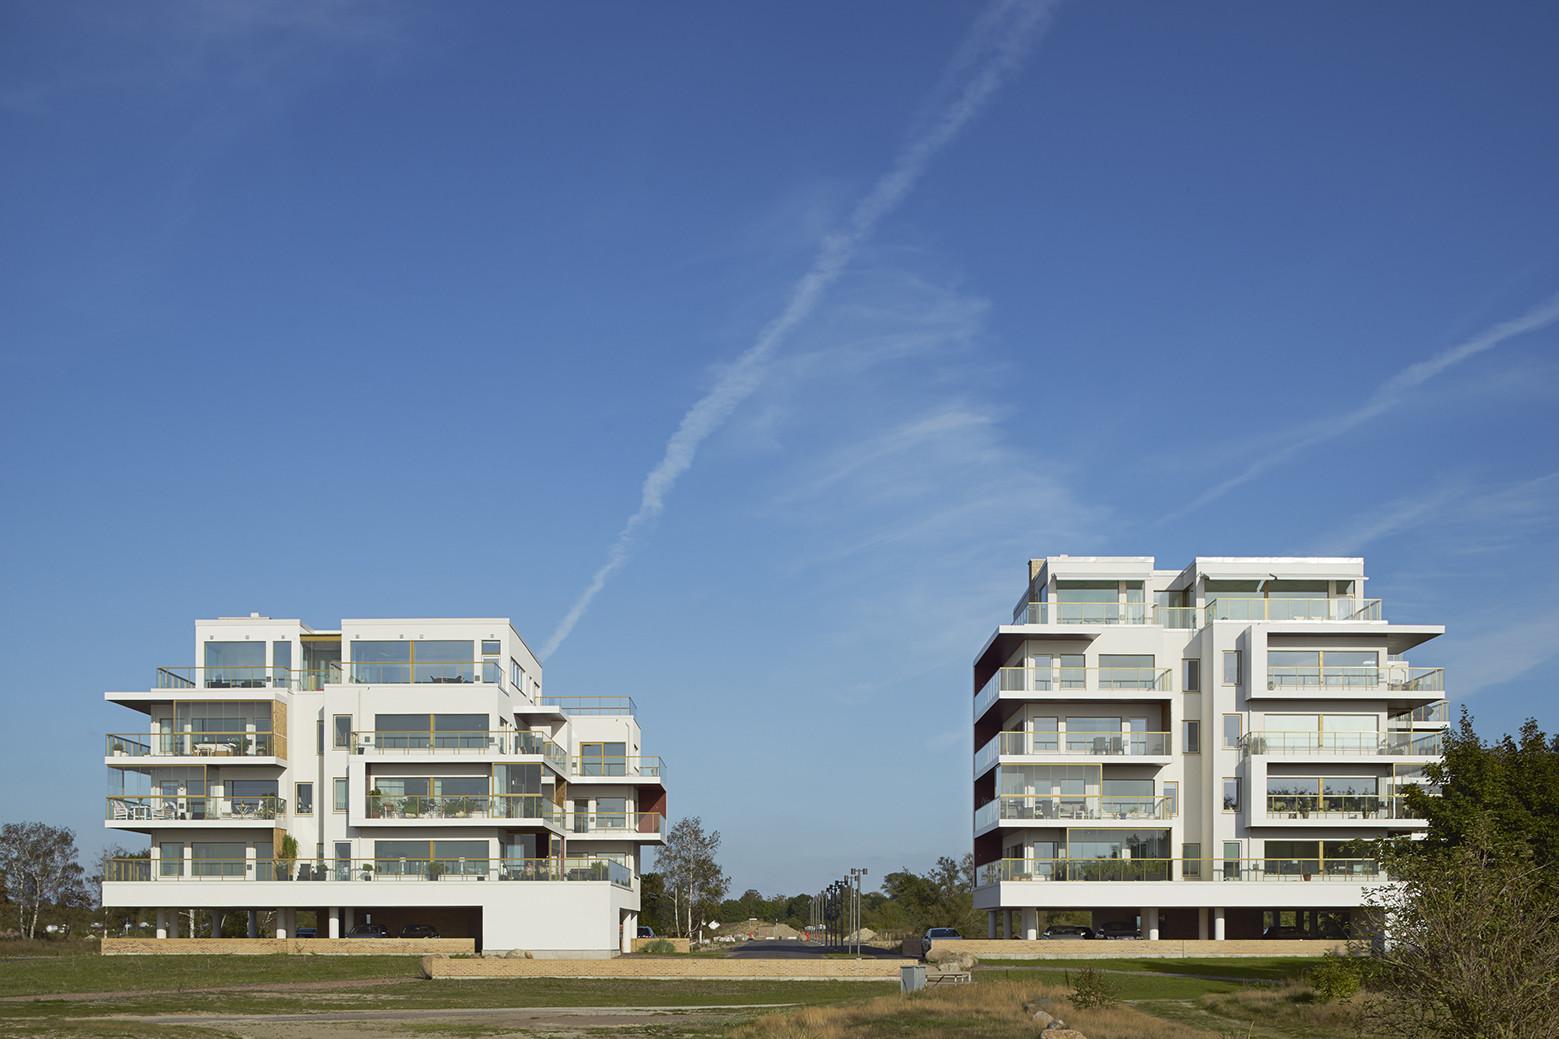 Lomma Apartments / FOJAB arkitekter, © Åke E:son Lindman